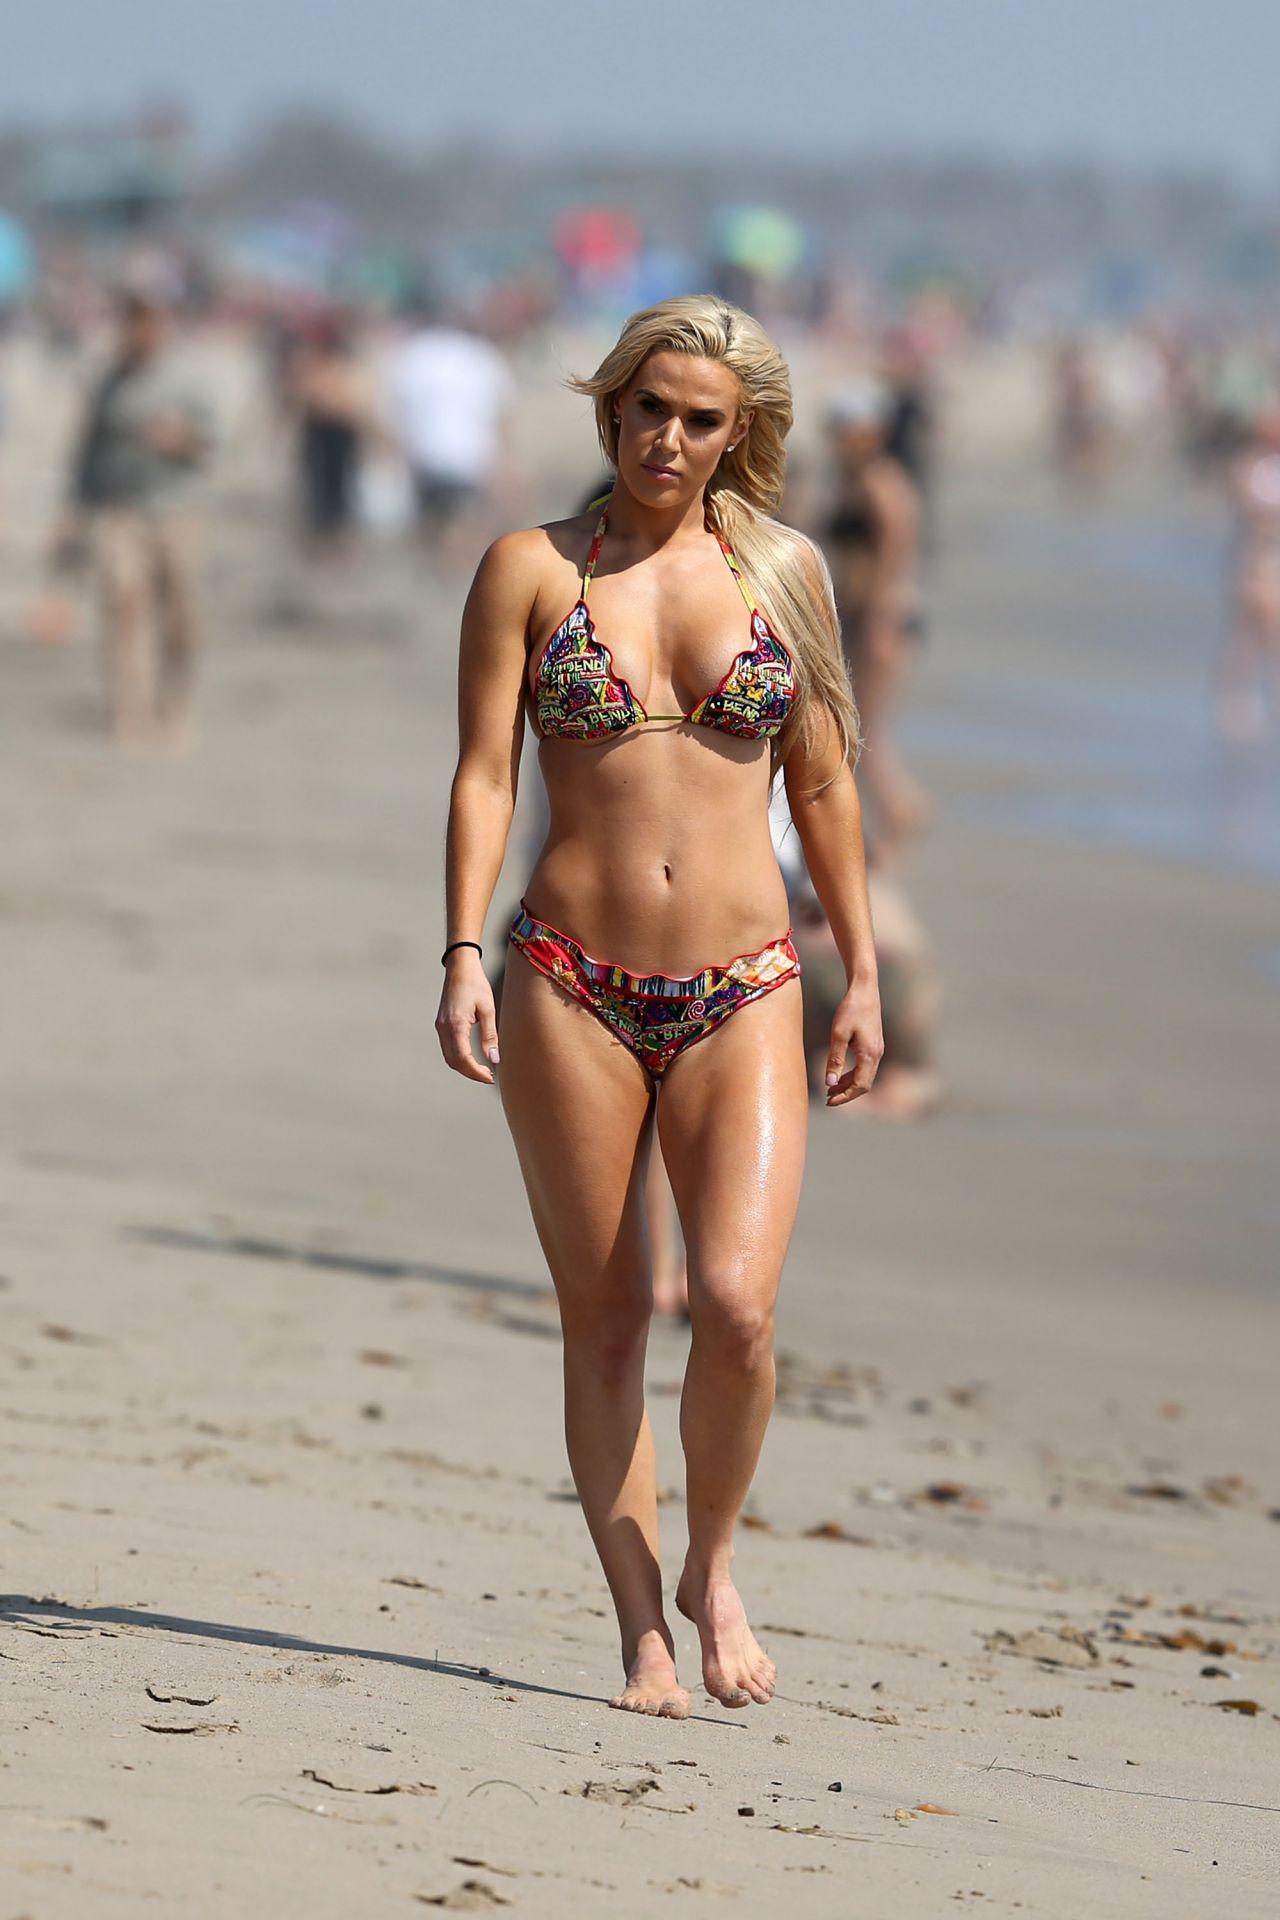 Lana In Bikini Beach In Los Angeles 10 23 2017